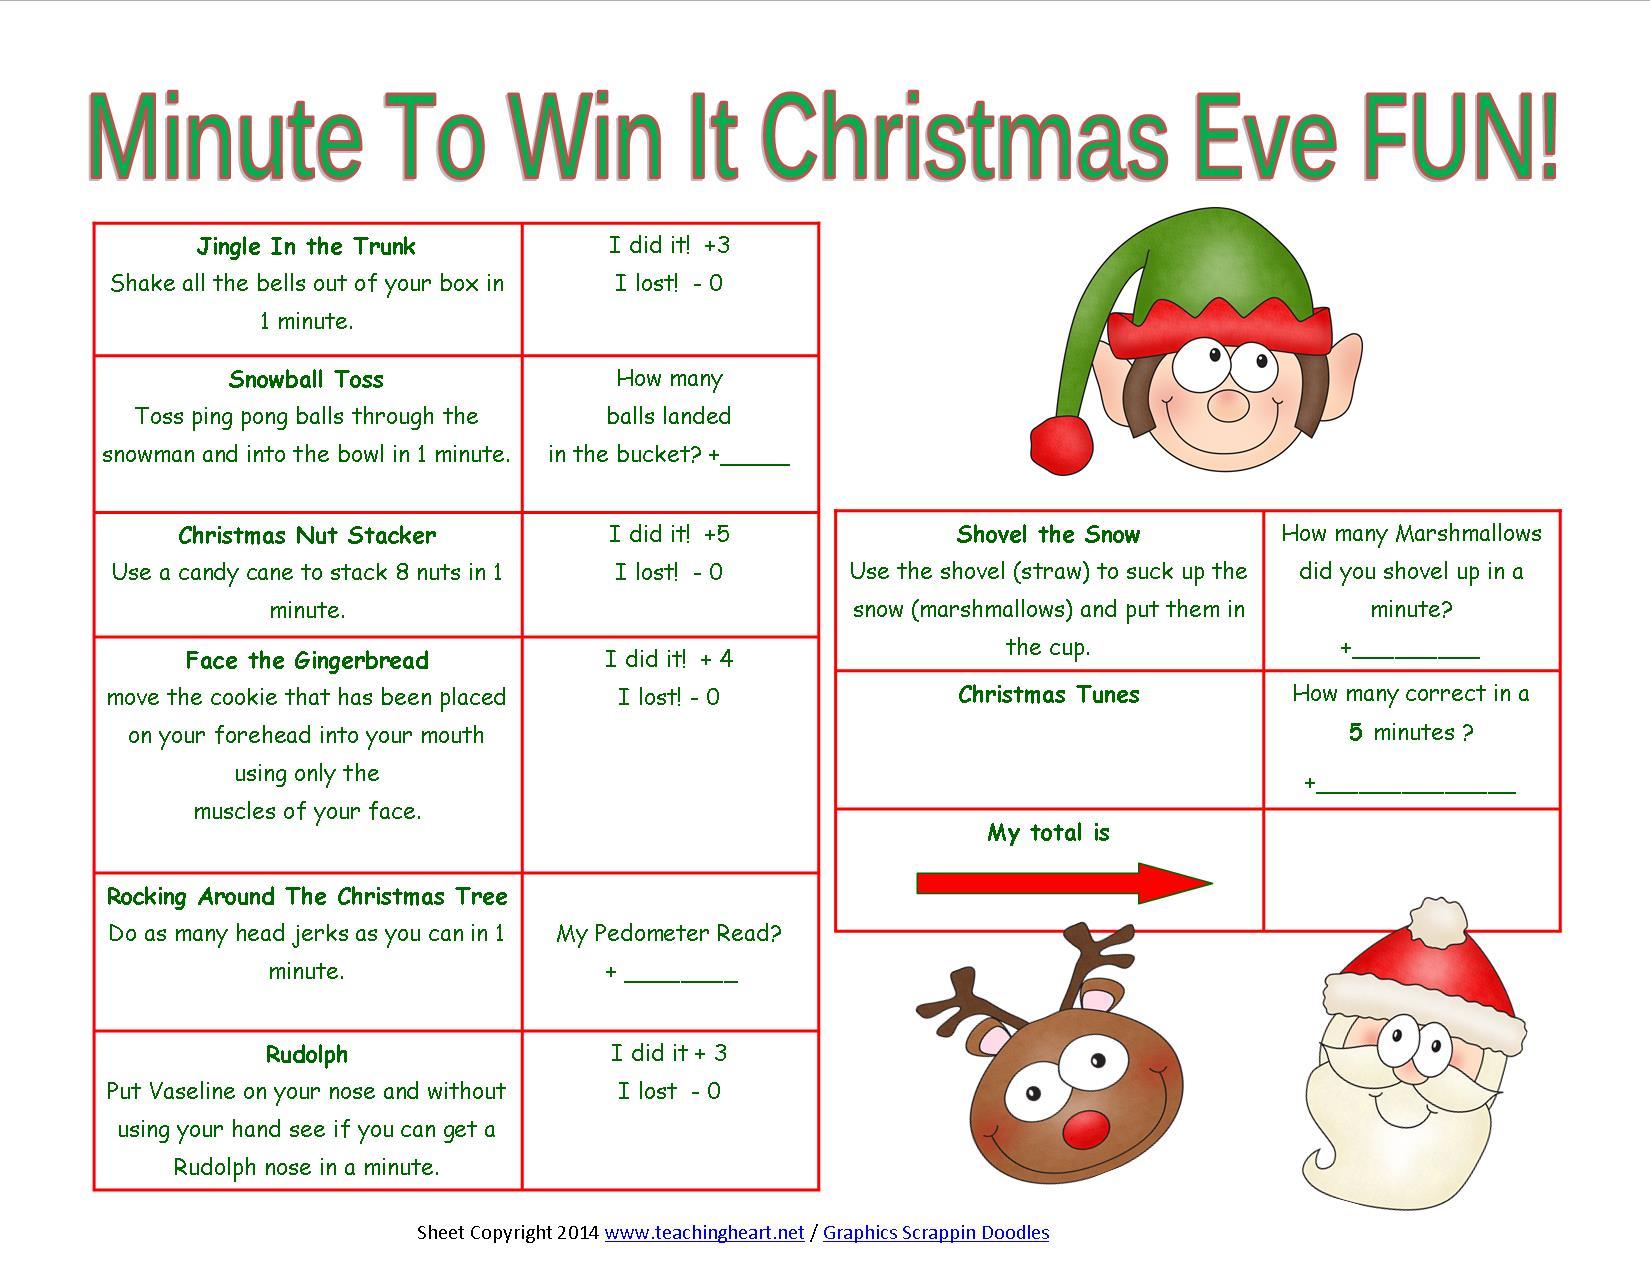 Christmas Printables for Next Year!!! - Teaching Heart Blog Teaching ...